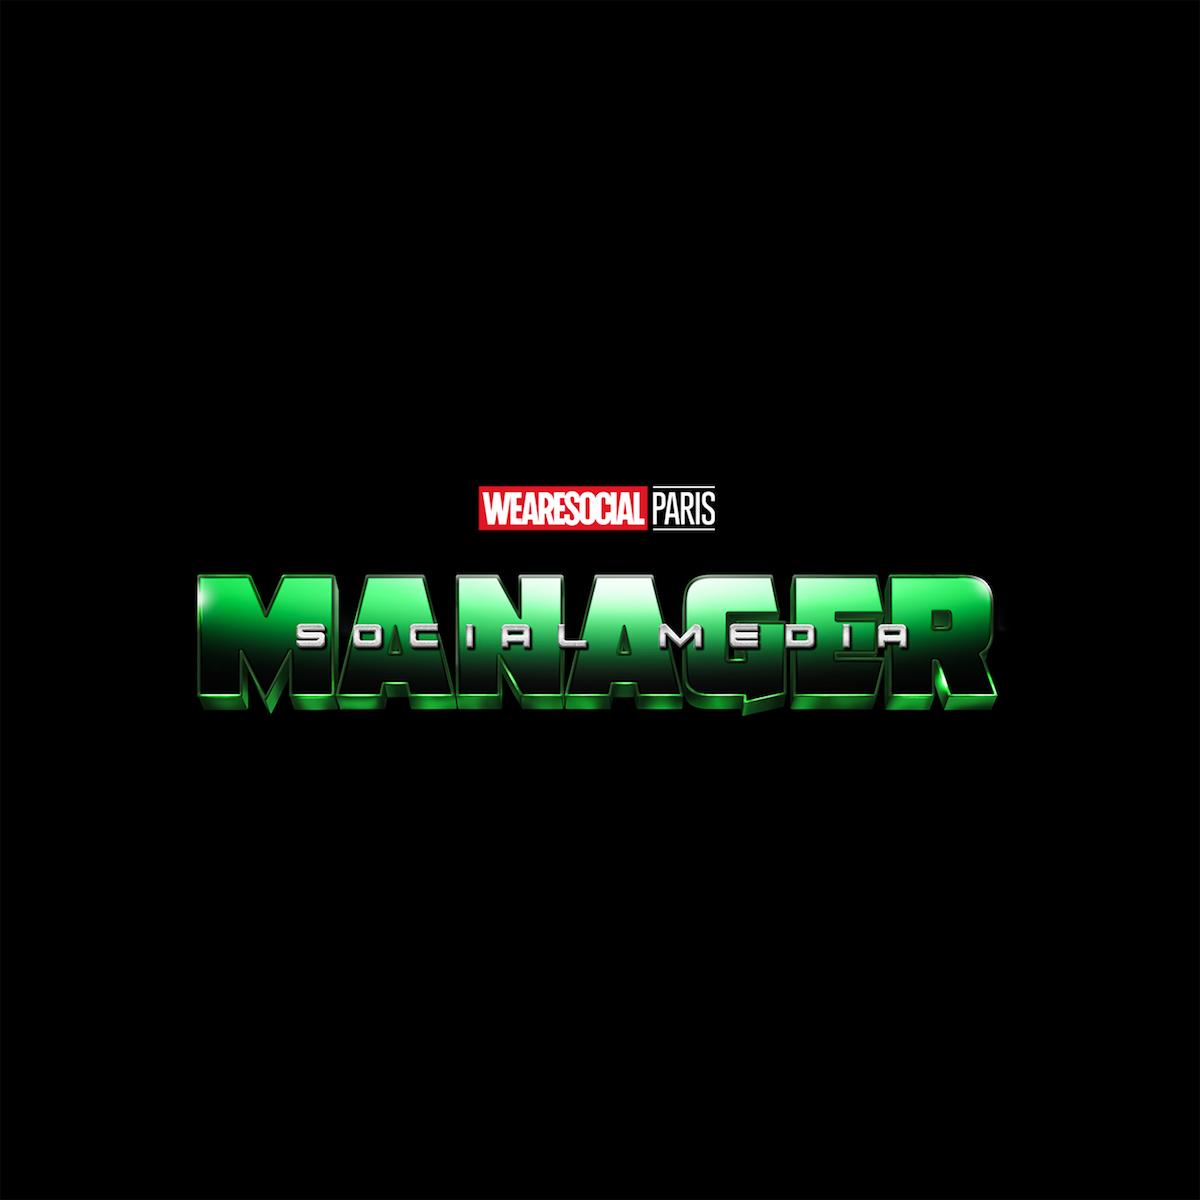 Superhero Logos for creative agency job titles - Social Media Manager / The Hulk